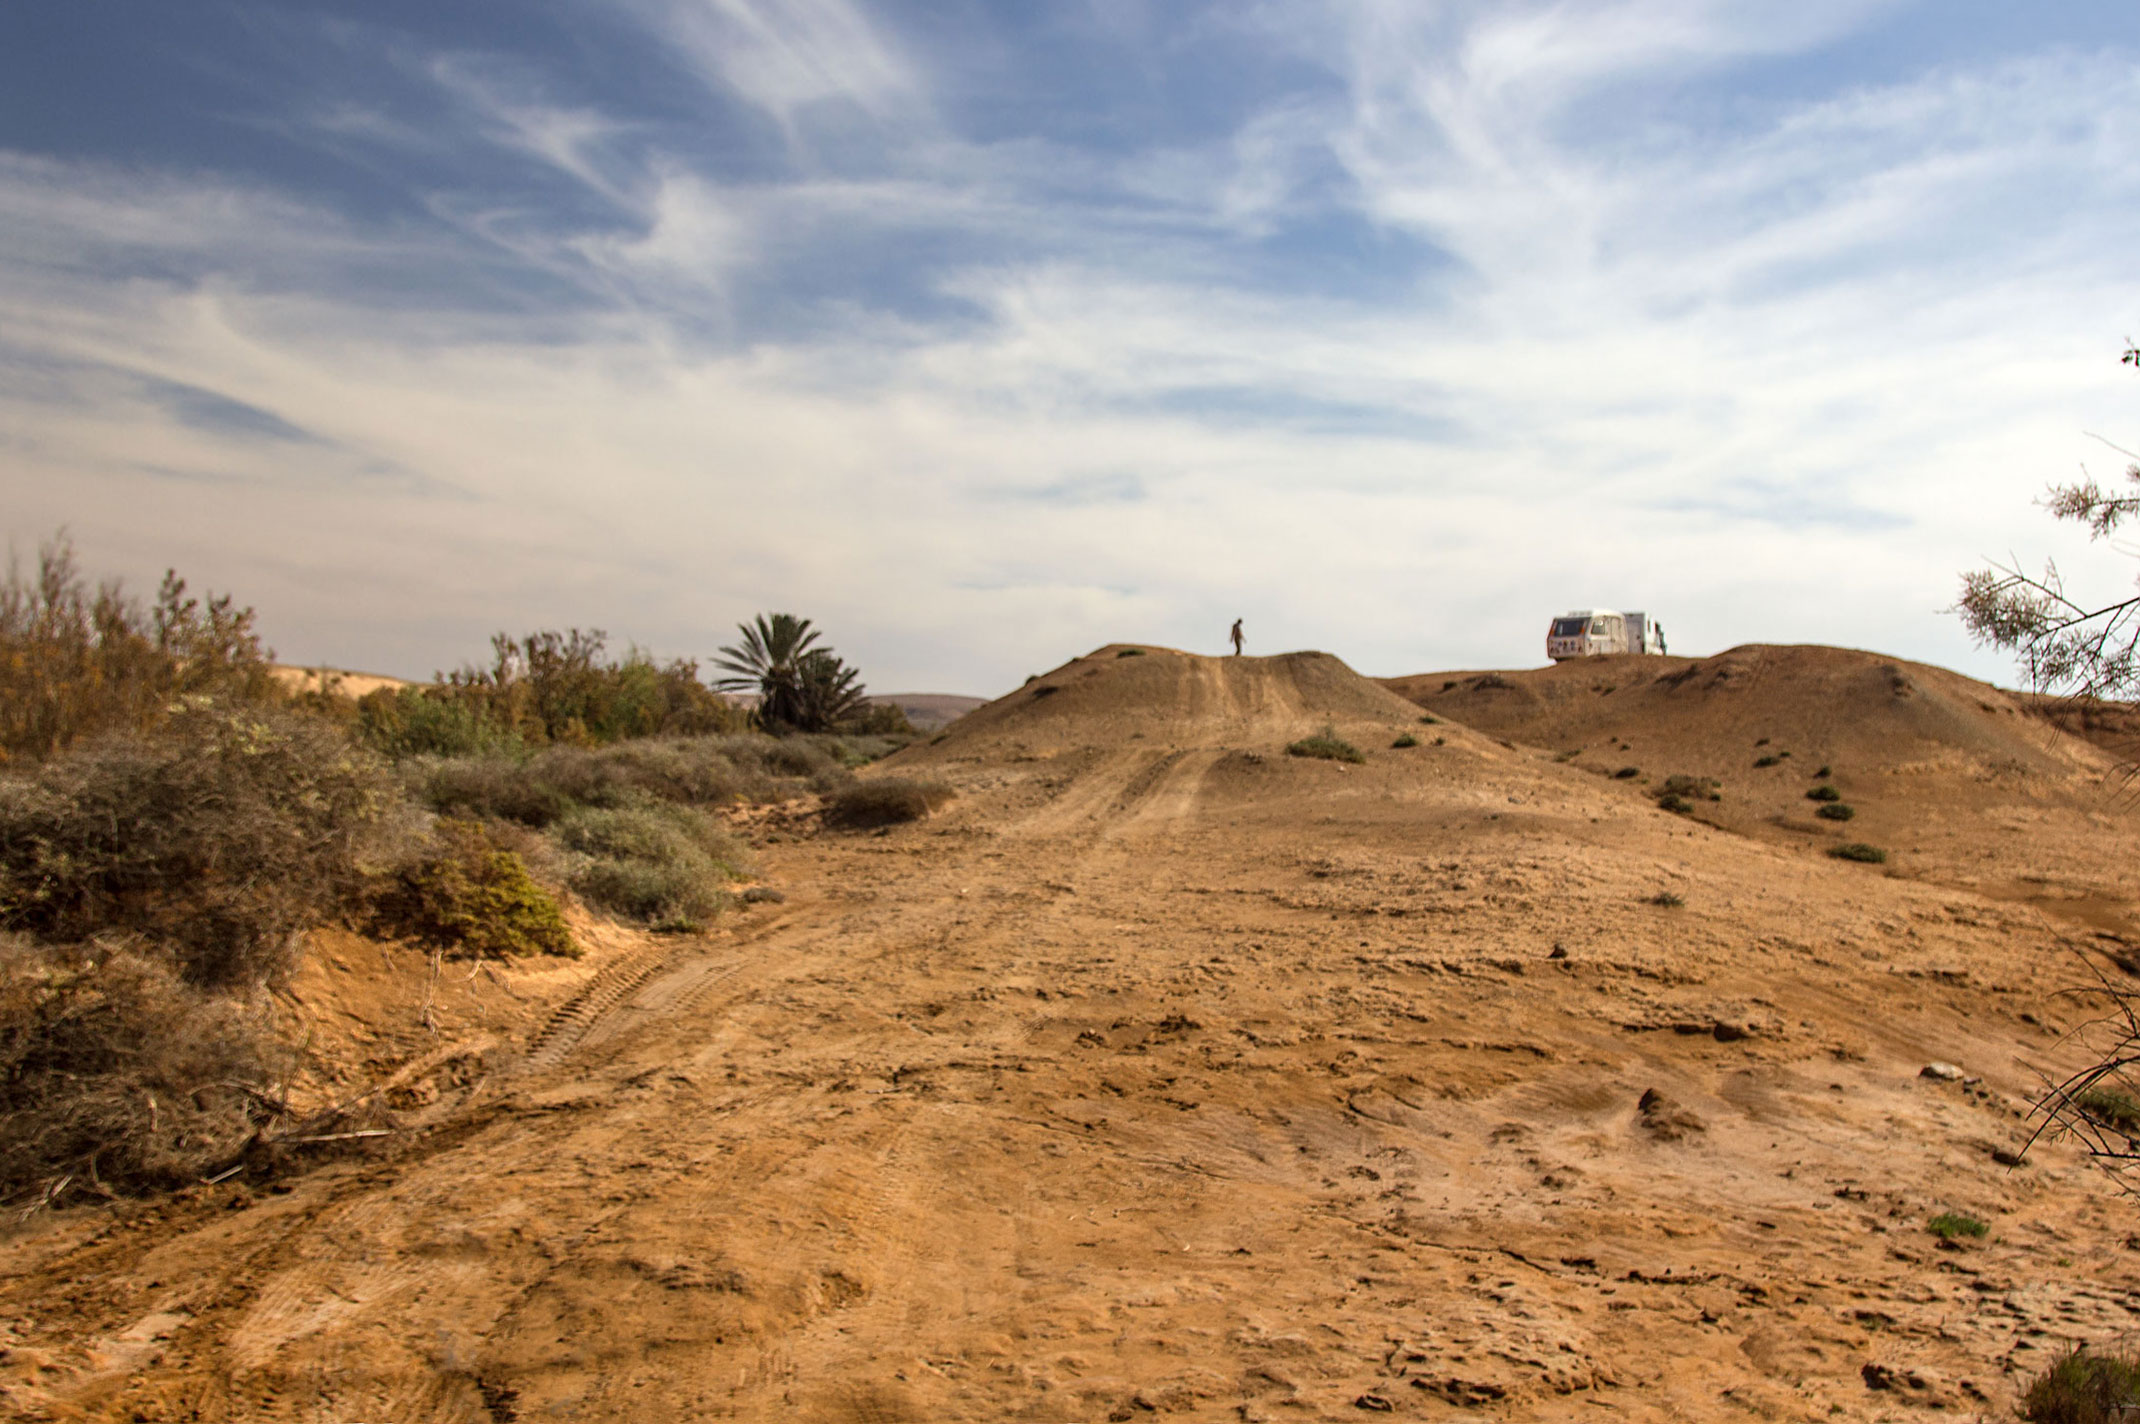 Dojazd do fortu w Aoreora.Maroko